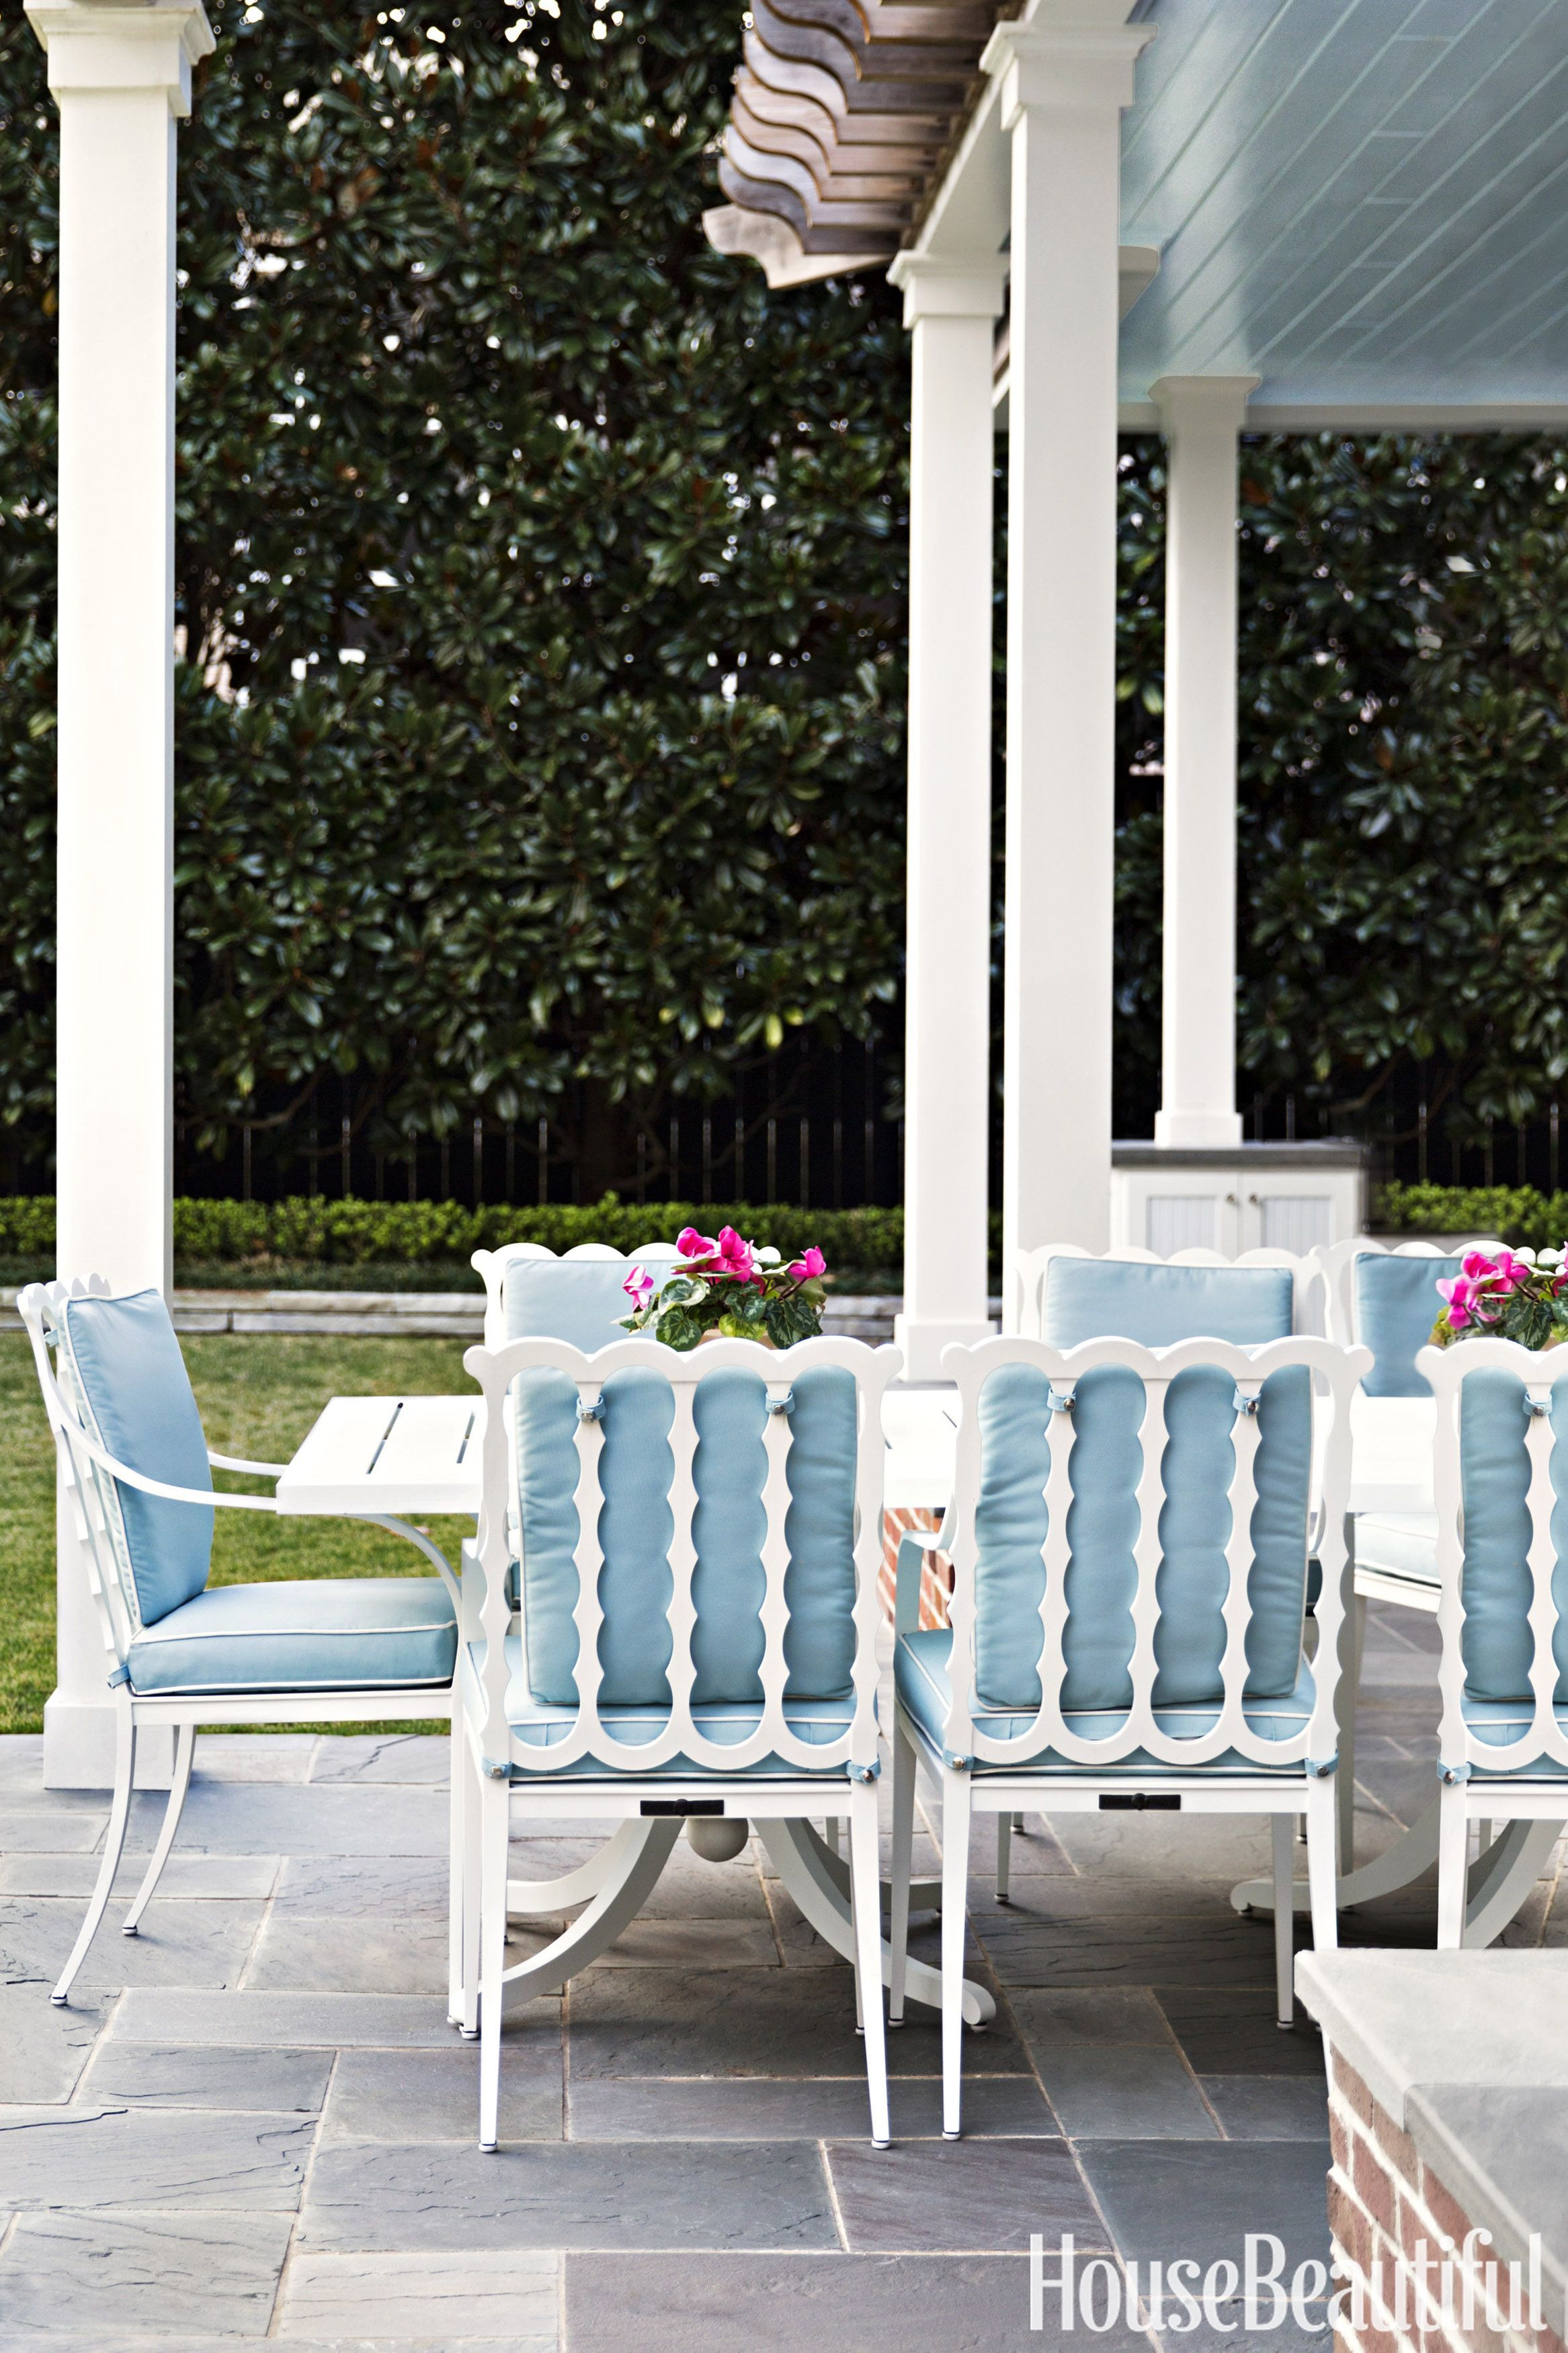 21 Glamorous Patio Design Australia That Will Inspire